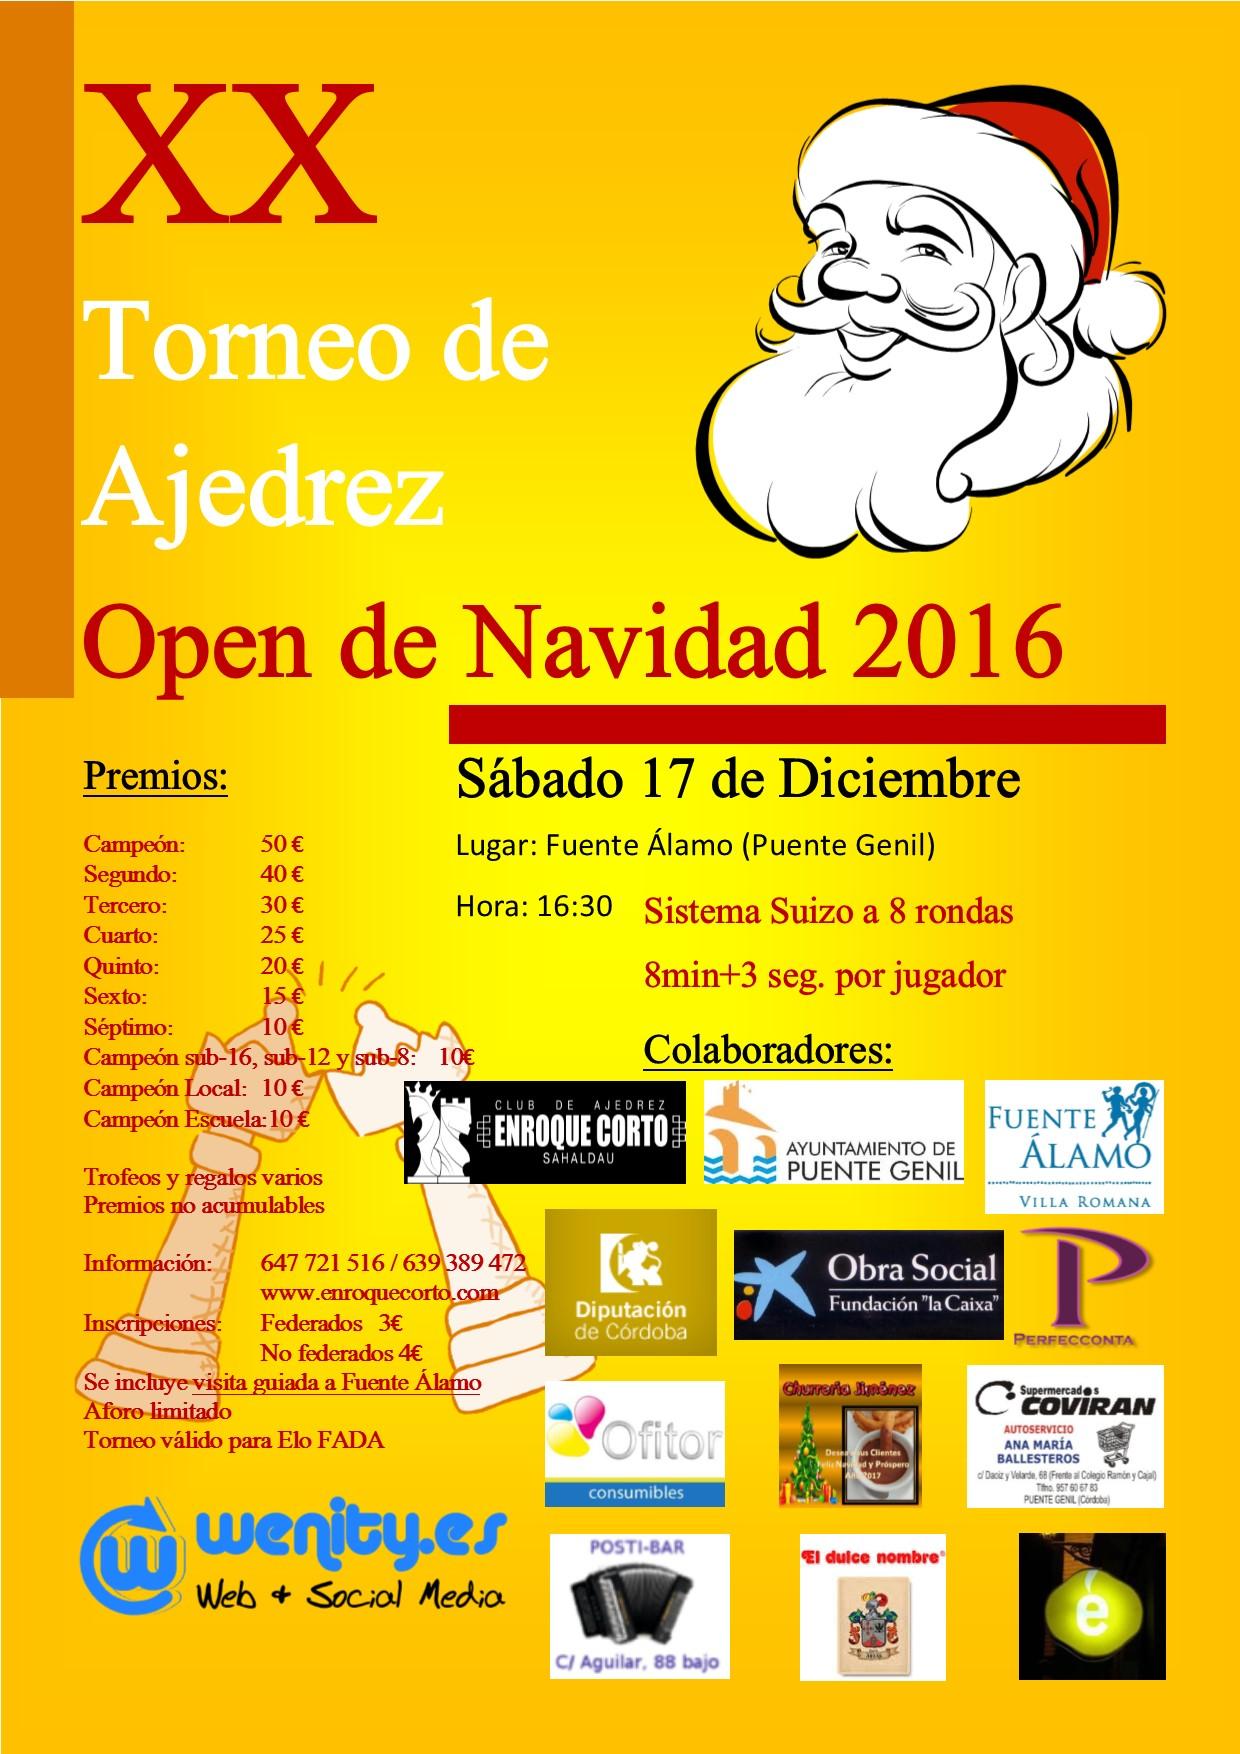 Torneo Ajedrez Navidad Puente Genil 2016